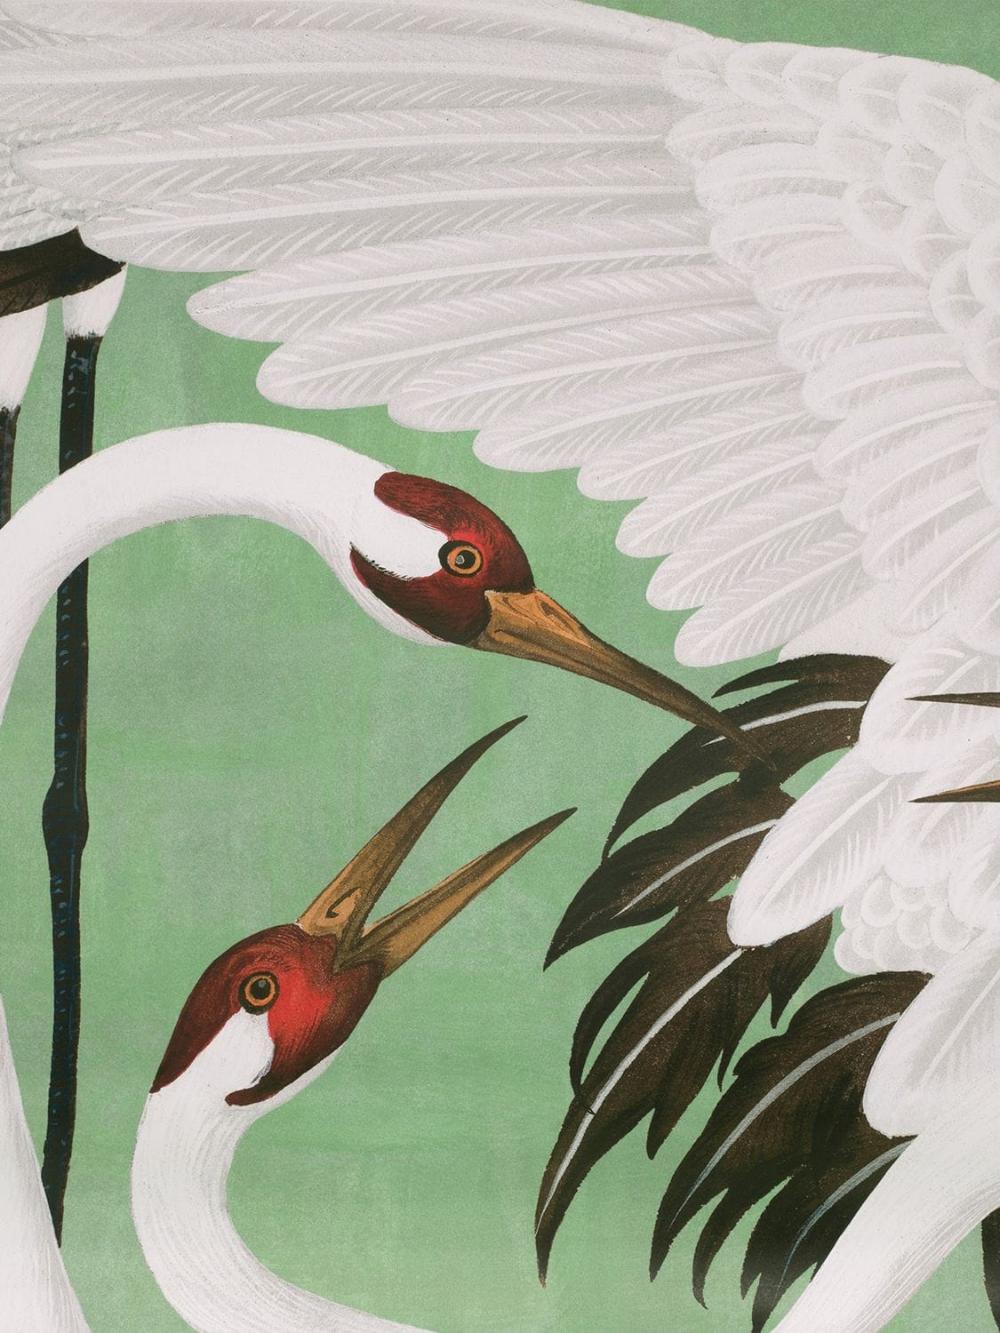 Gucci Heron printed wallpaper panels Luisaviaroma in